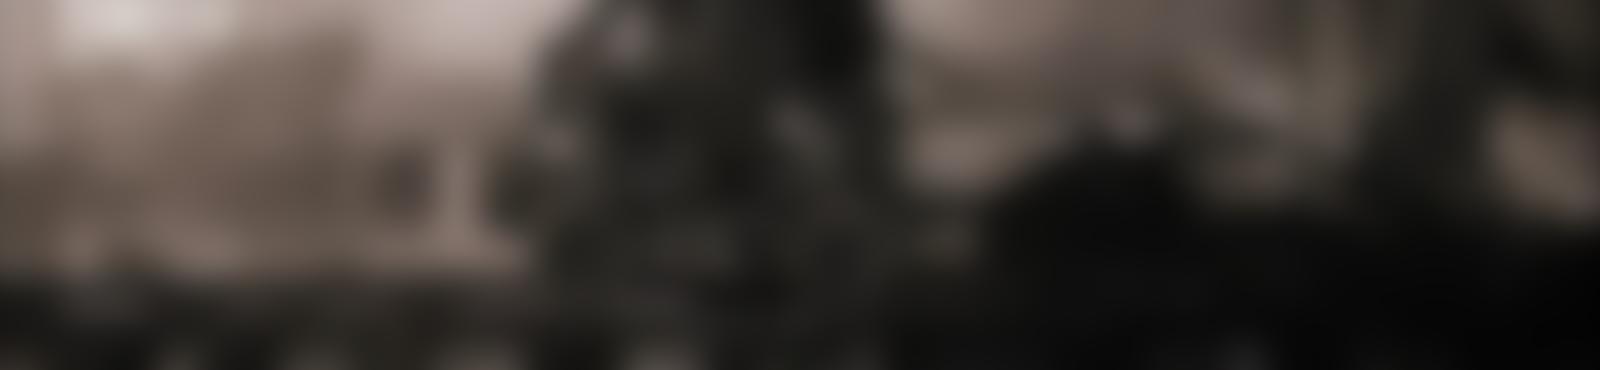 Blurred 9087ed74 3651 466f be59 3f9e9553f911